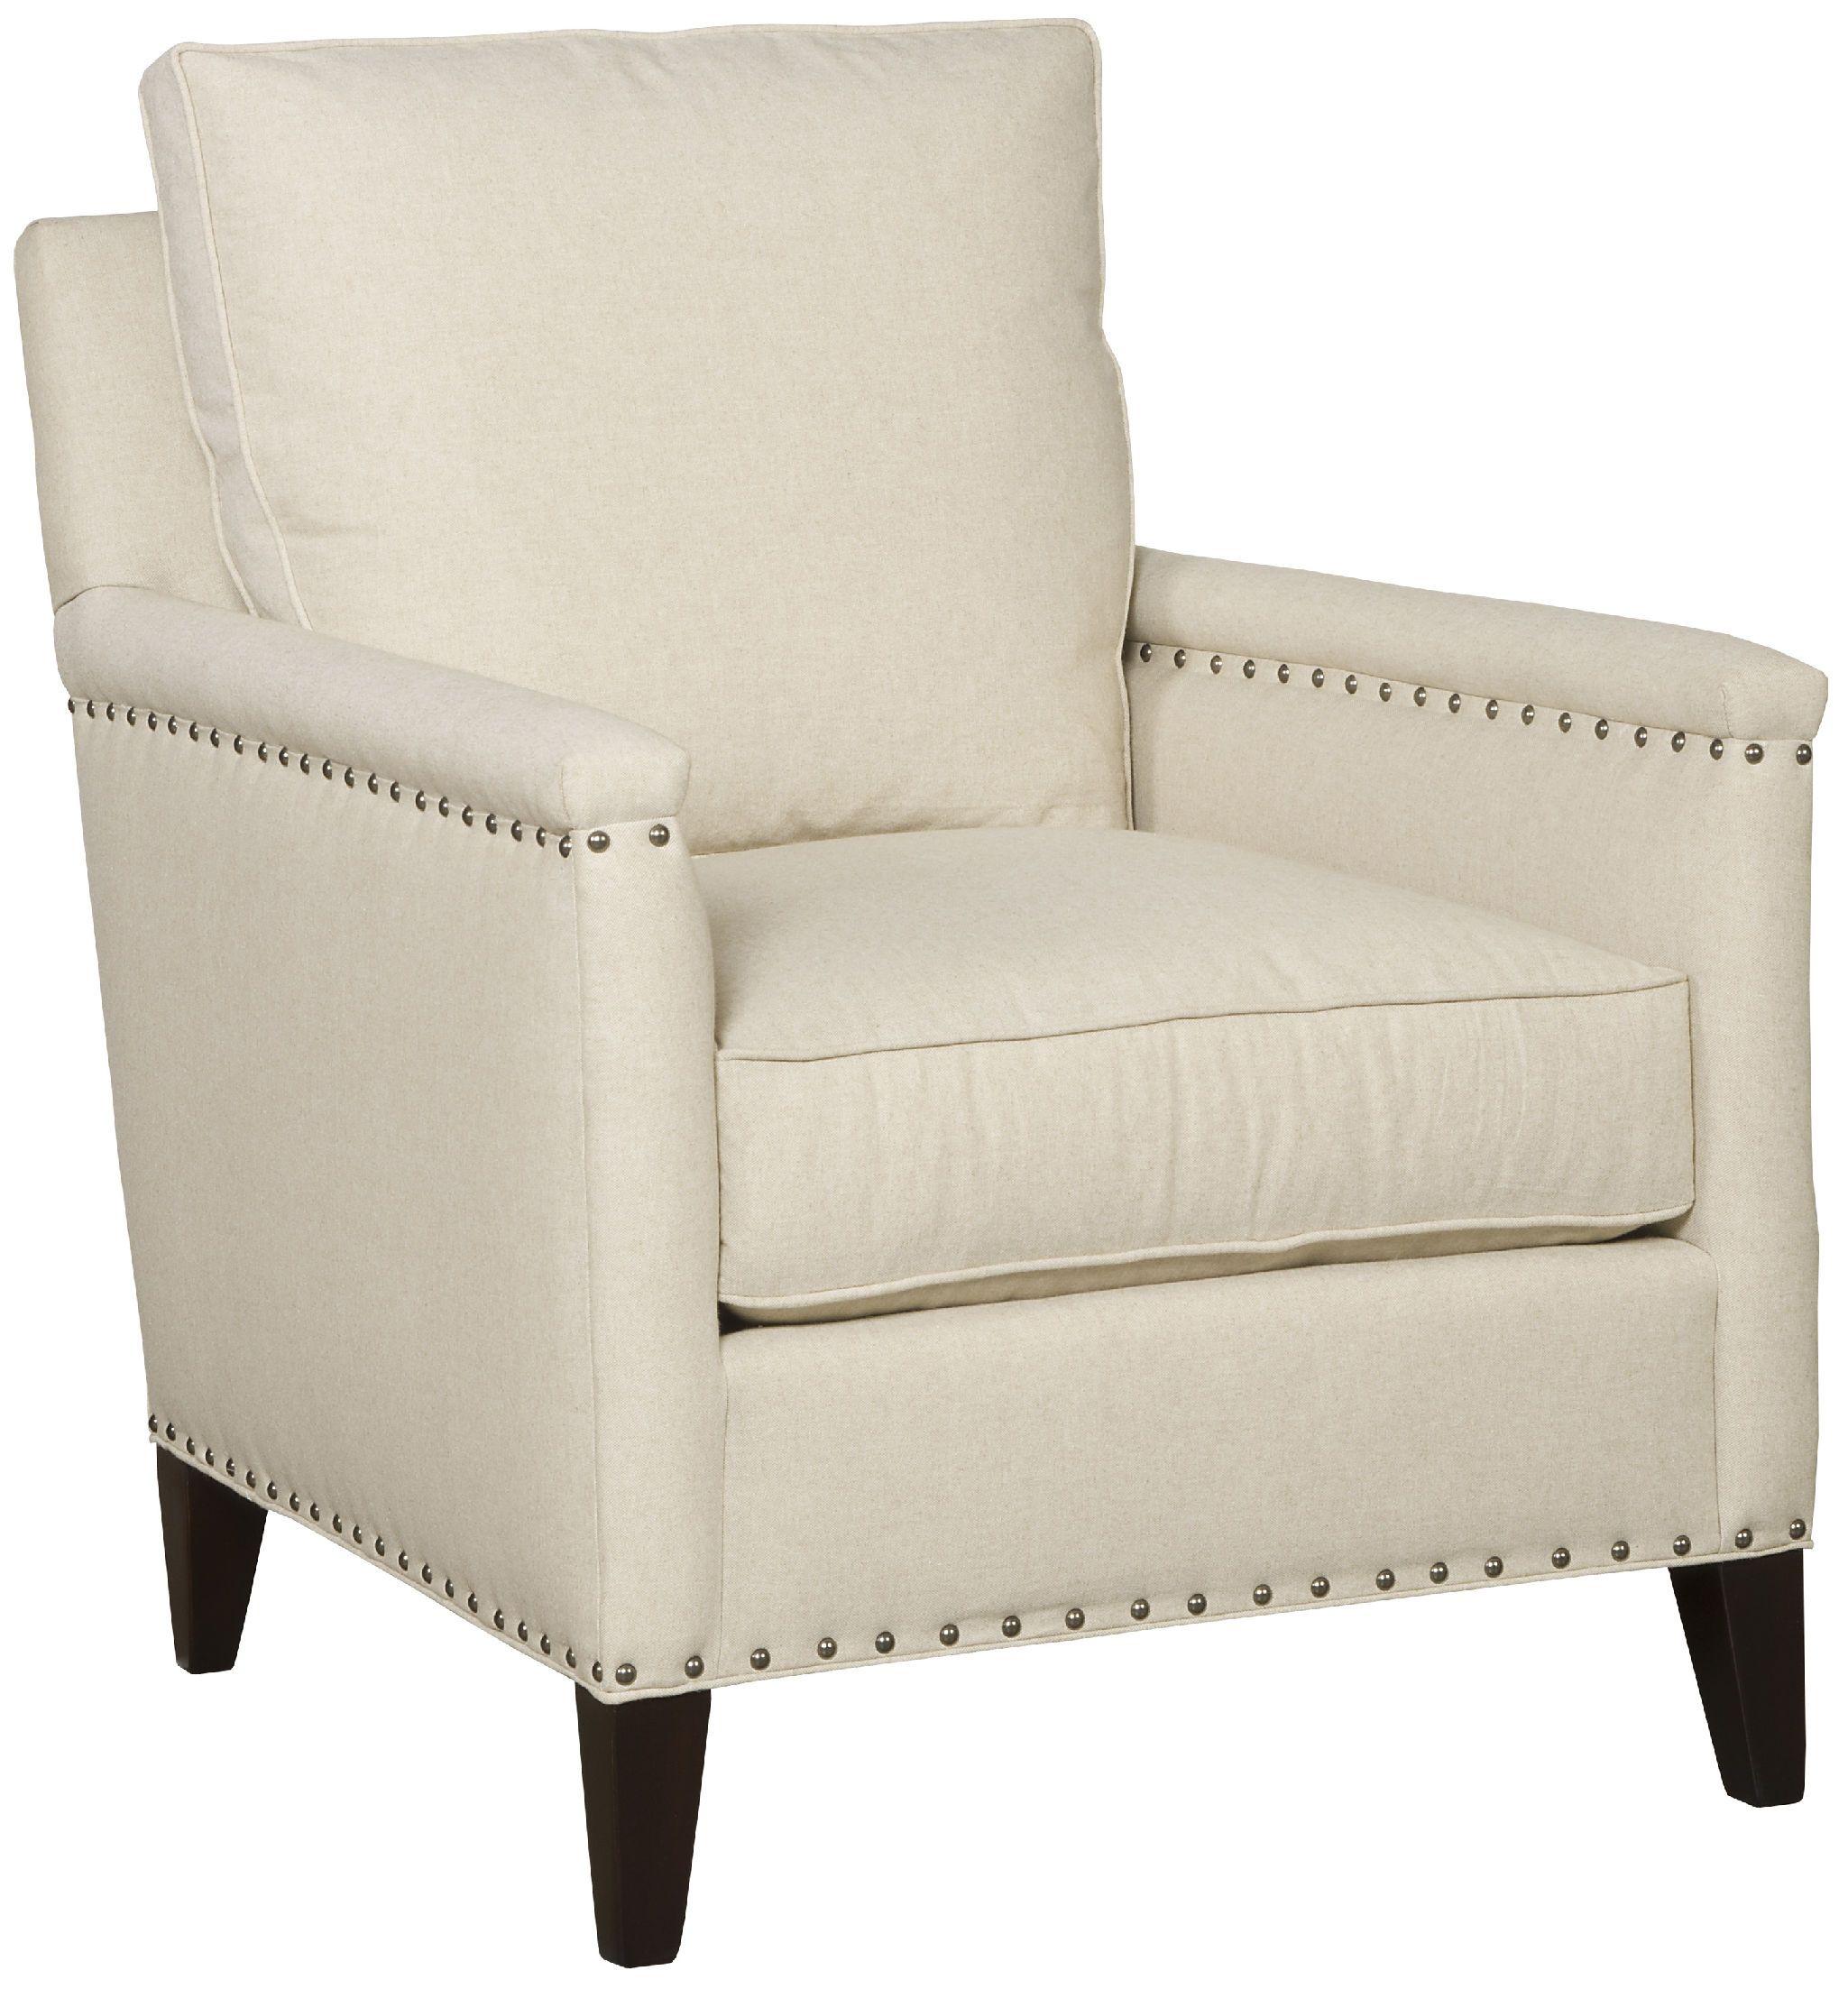 Vanguard Living Room Liz Chair V368 CH   Vanguard Furniture   Conover, NC